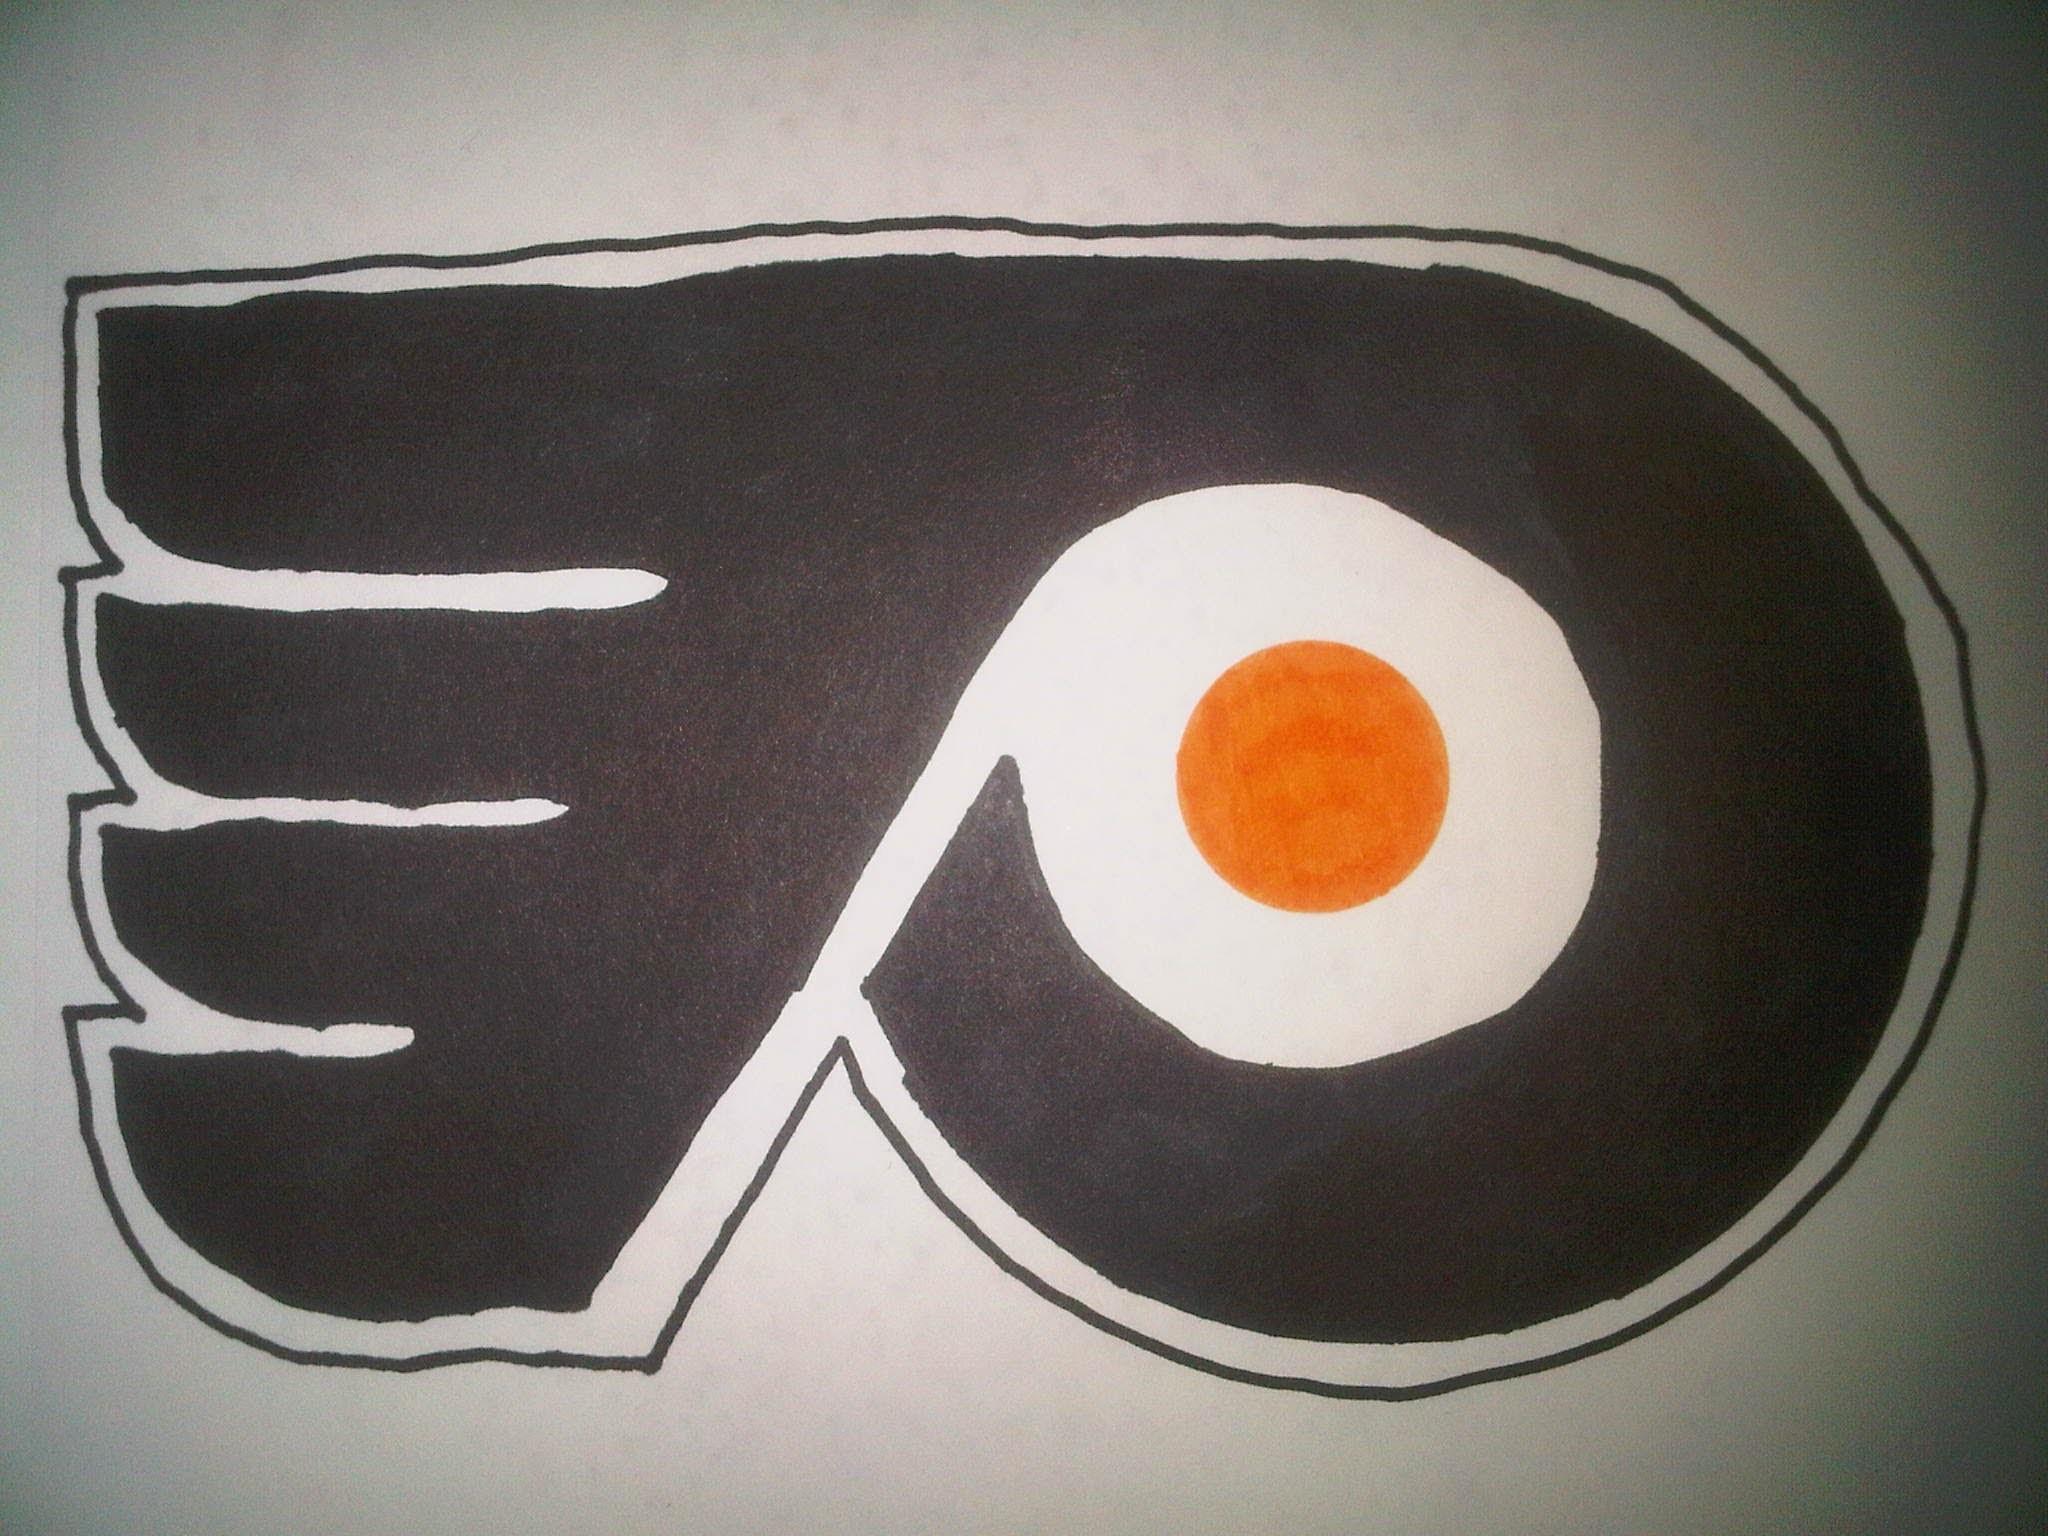 How to Draw the Philadelphia Flyers logo – YouTube